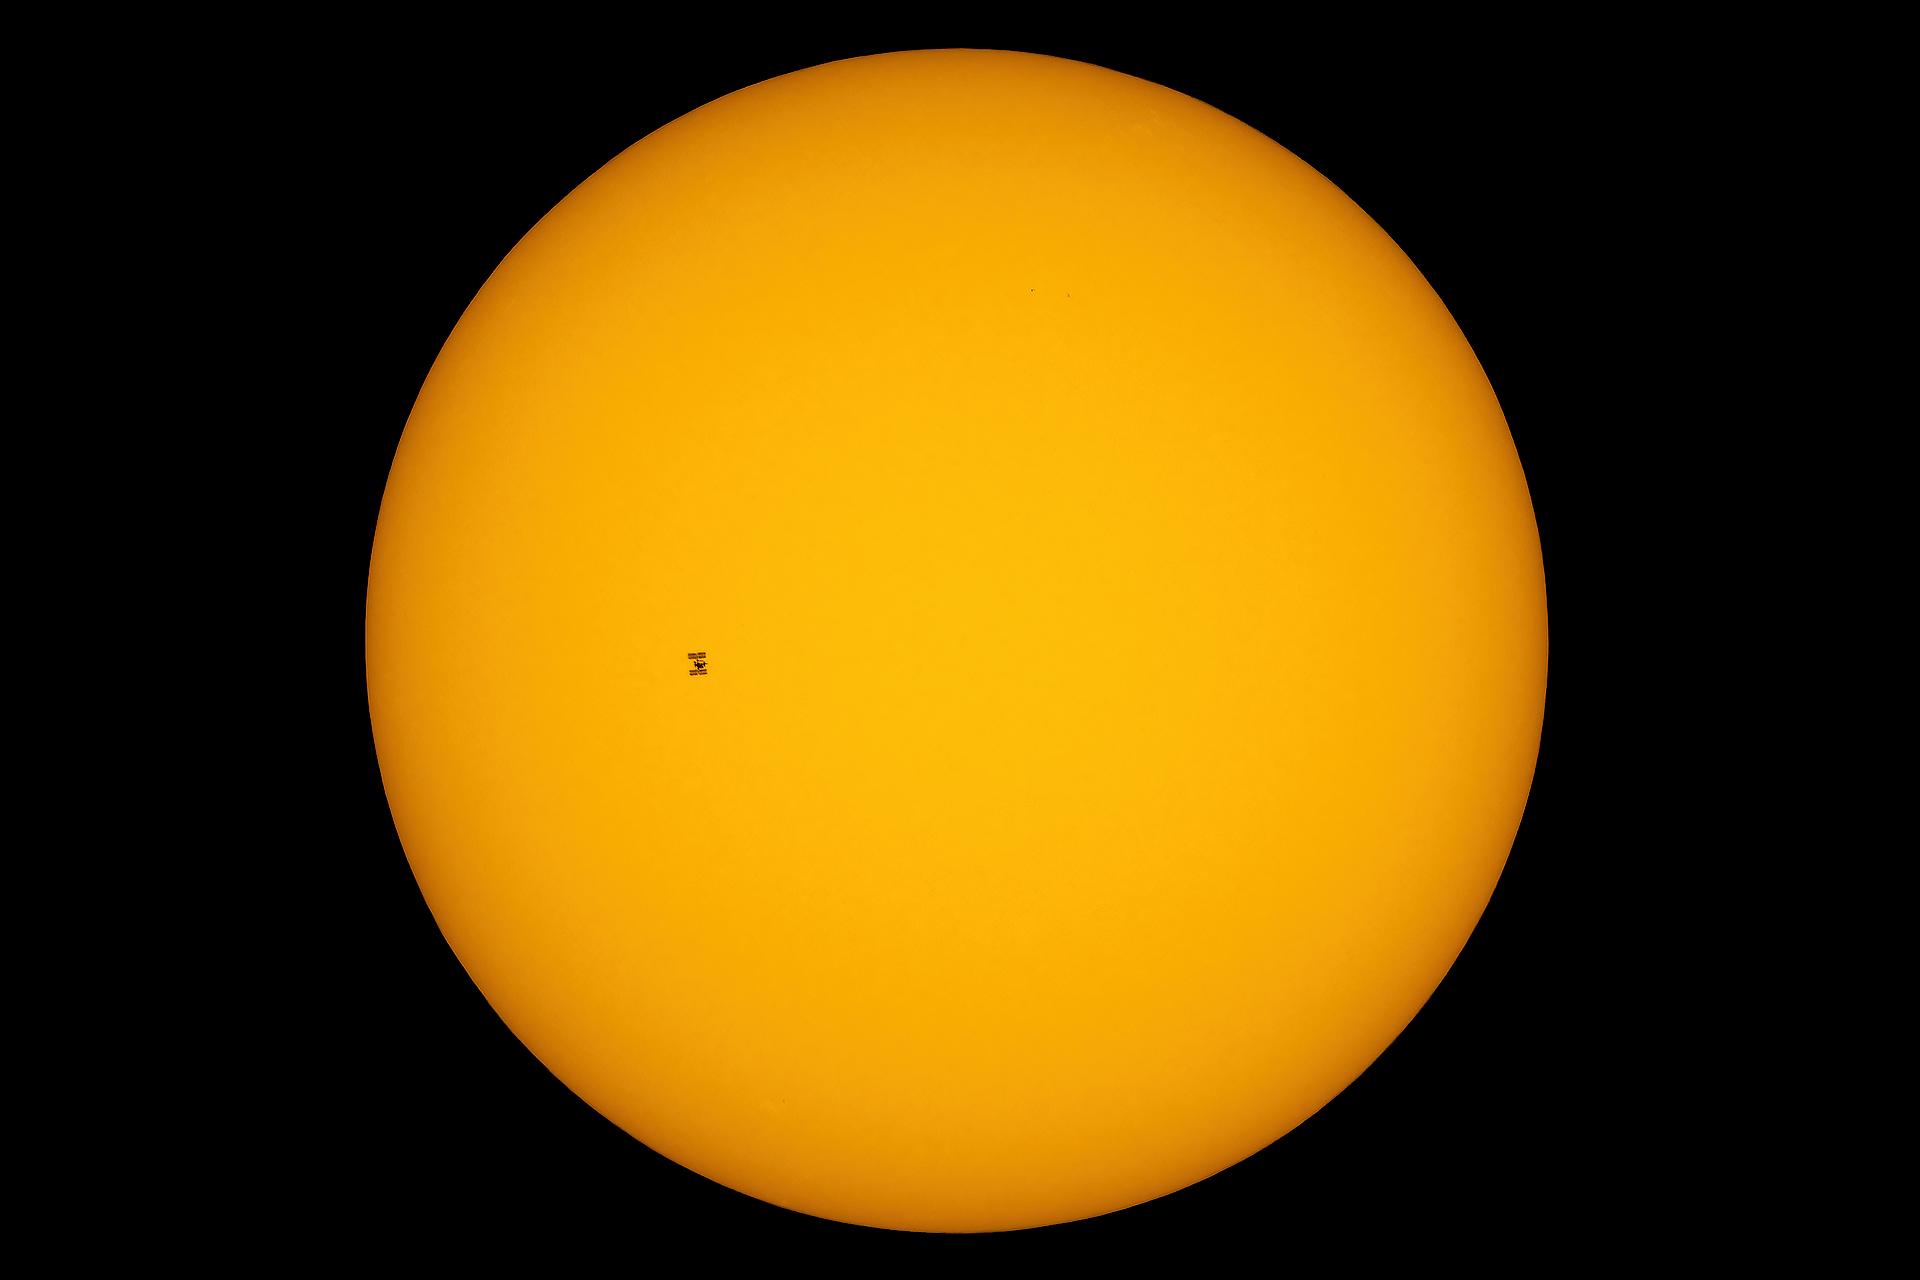 12sie20_ISS_Sun_G1144_0.png